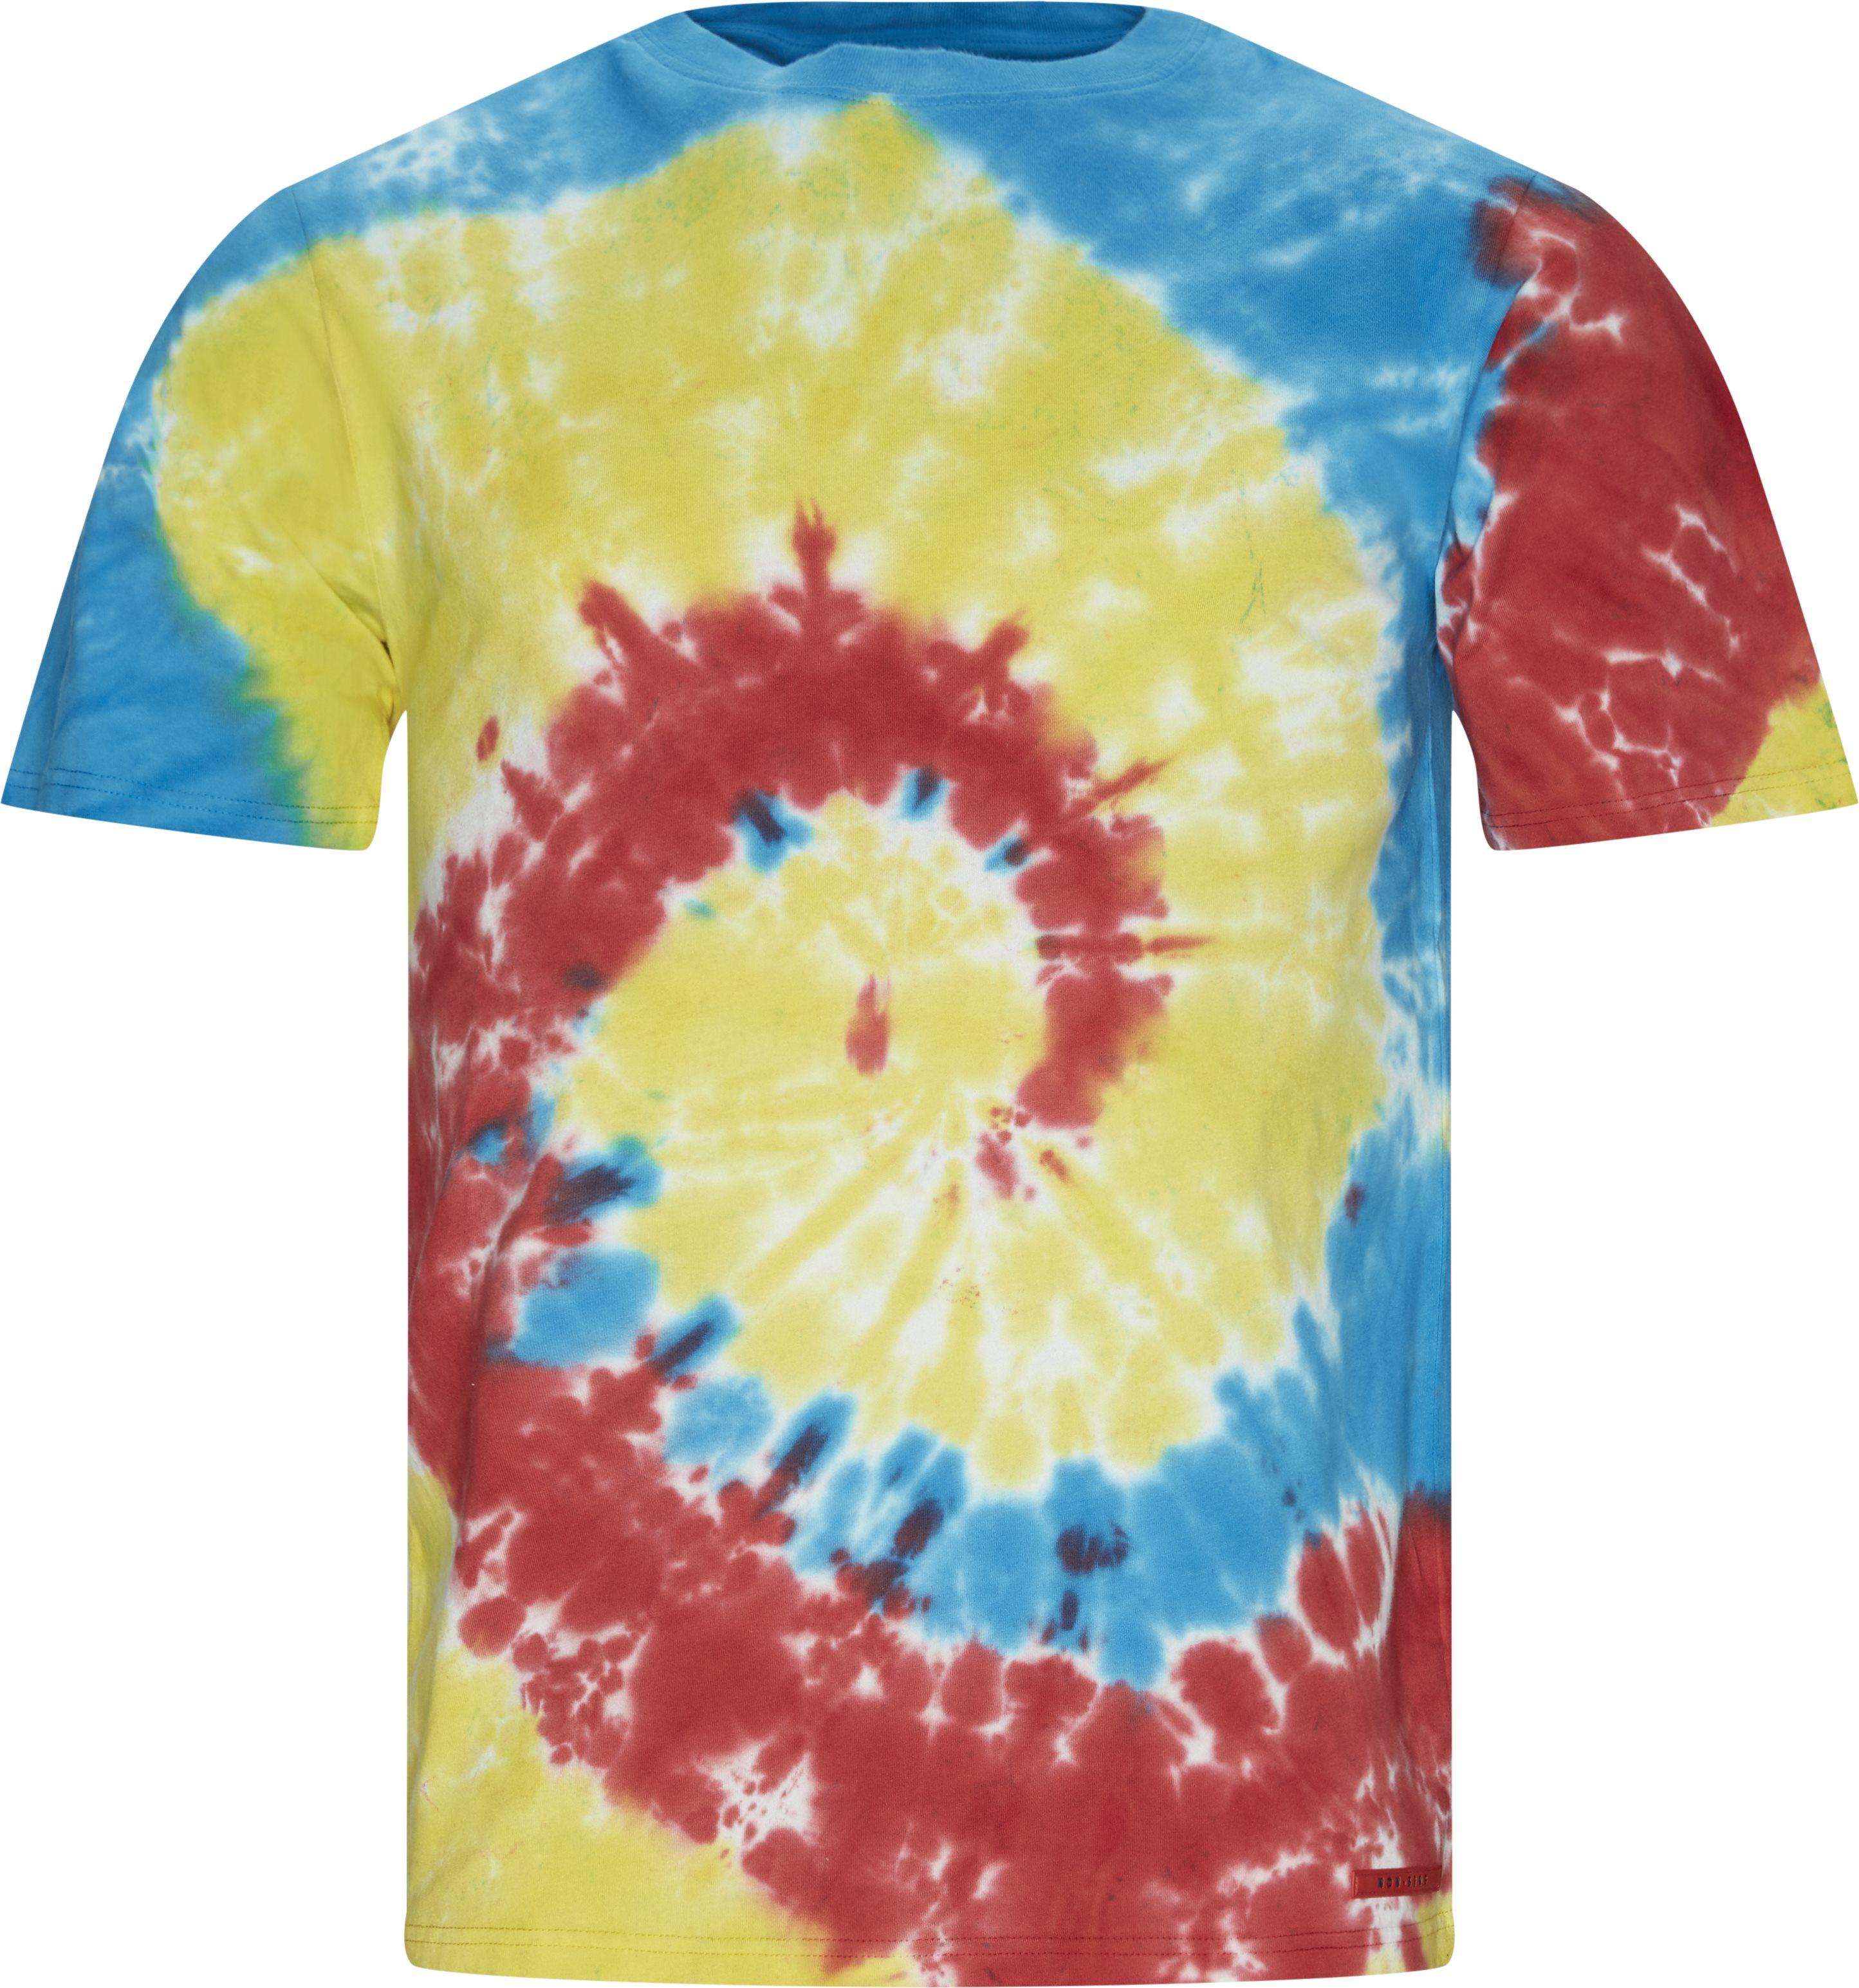 Yokon Tee - T-shirts - Regular fit - Multi